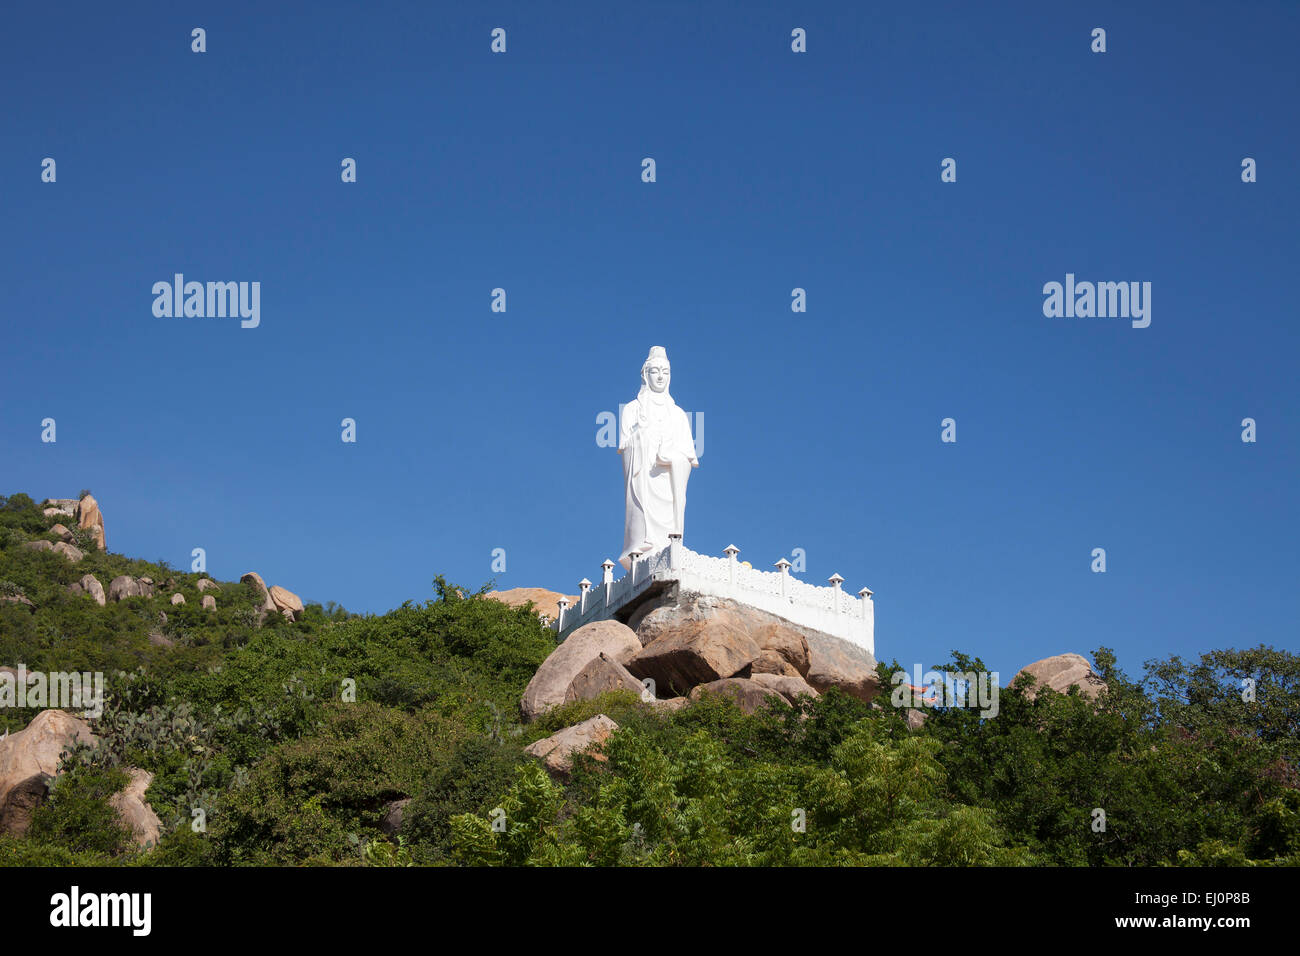 Thien, Vien, Truc Phan, Rang, Ninh, Thuan, Buddha, Buddha statue, Buddhism, Buddhist, figure, place of interest, - Stock Image